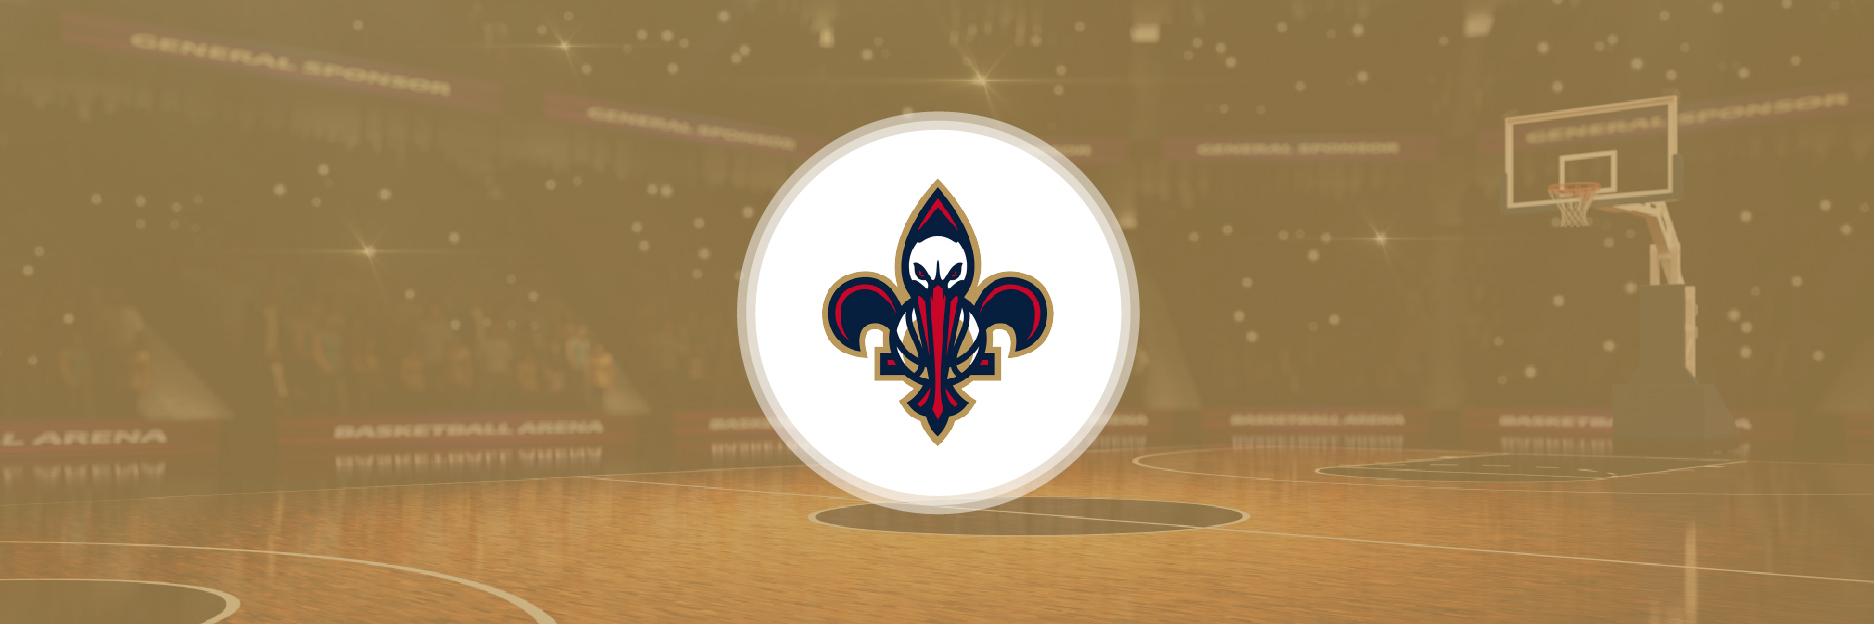 NBA New Orleans Pelicans 2020 Season Analysis